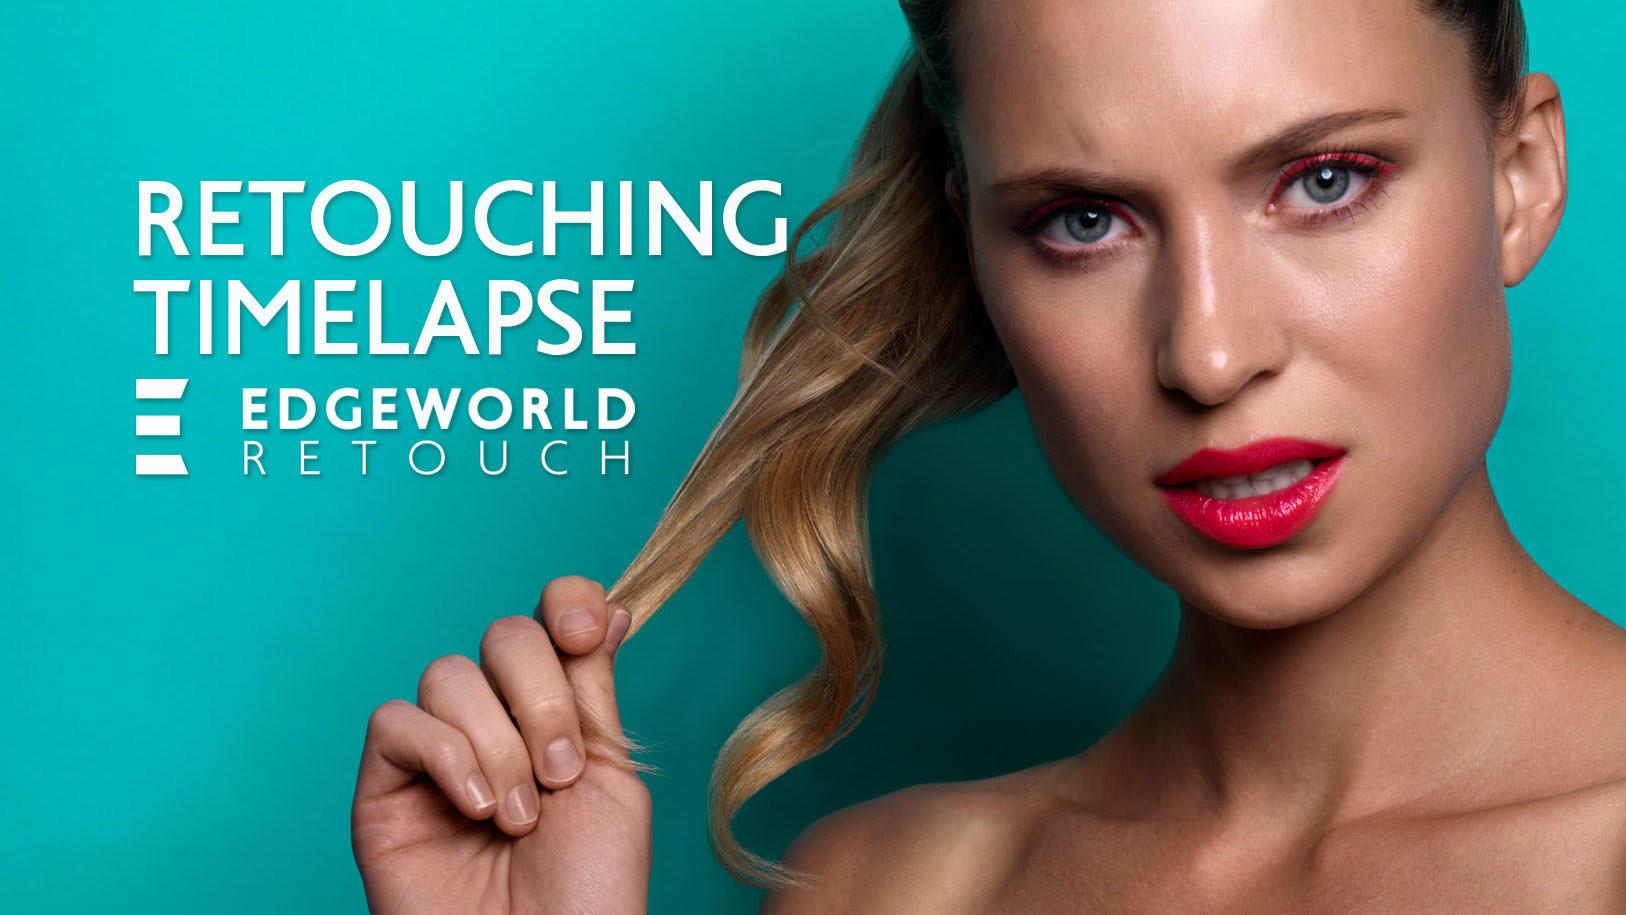 Boutique Retouching youtube-banner-speed-retouching-janina-scheuer Neon Beauty – Timlapse Speed Retouching Video Tutorial